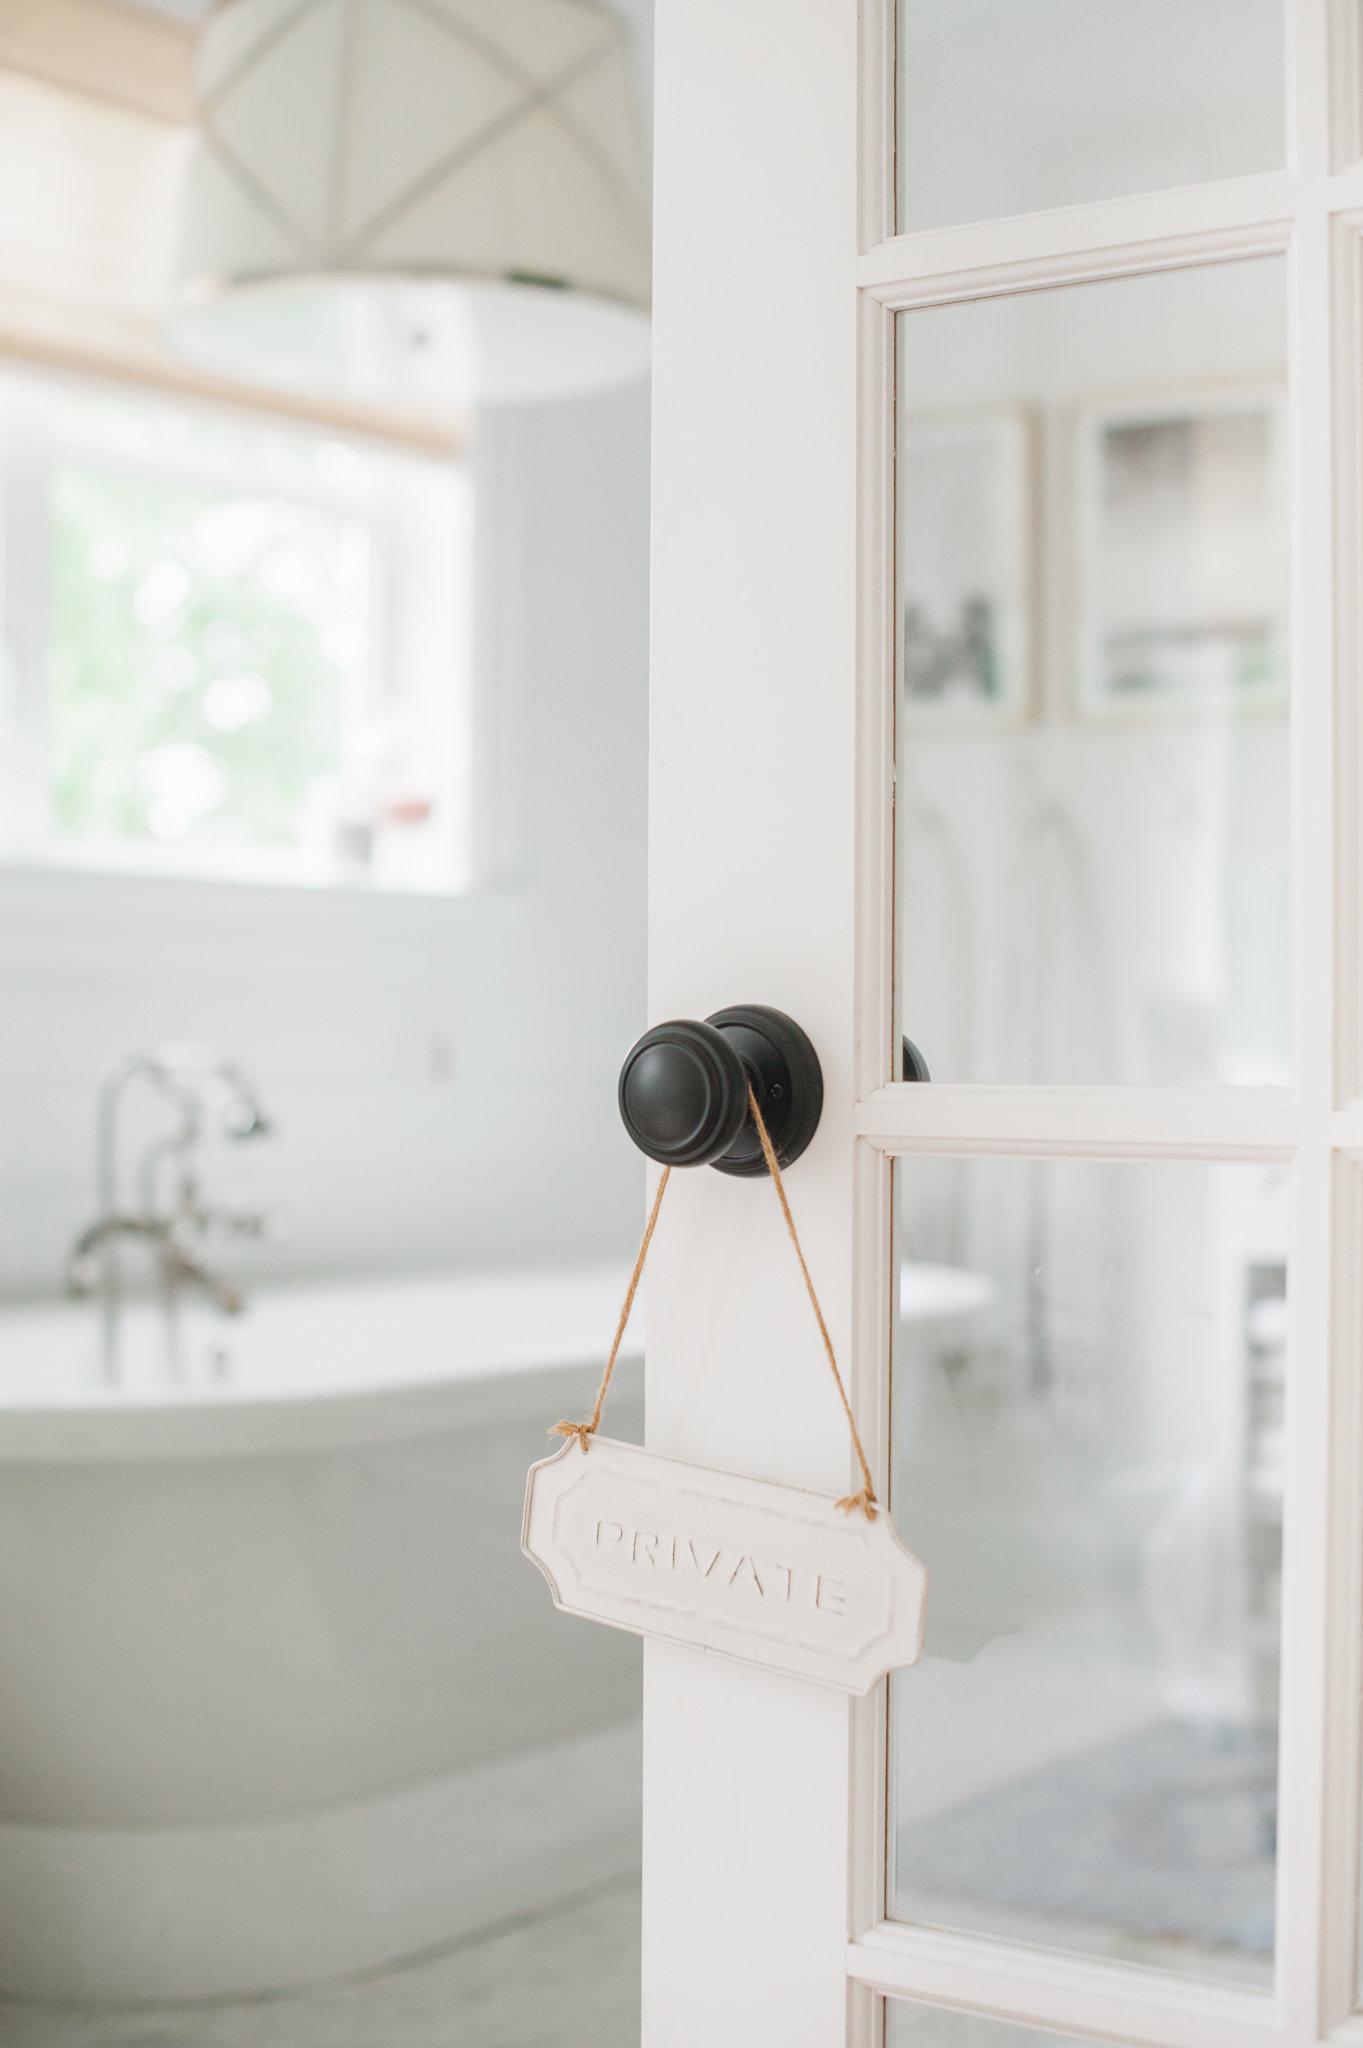 Bathroom White Cross Design MH Home Monika Hibbs